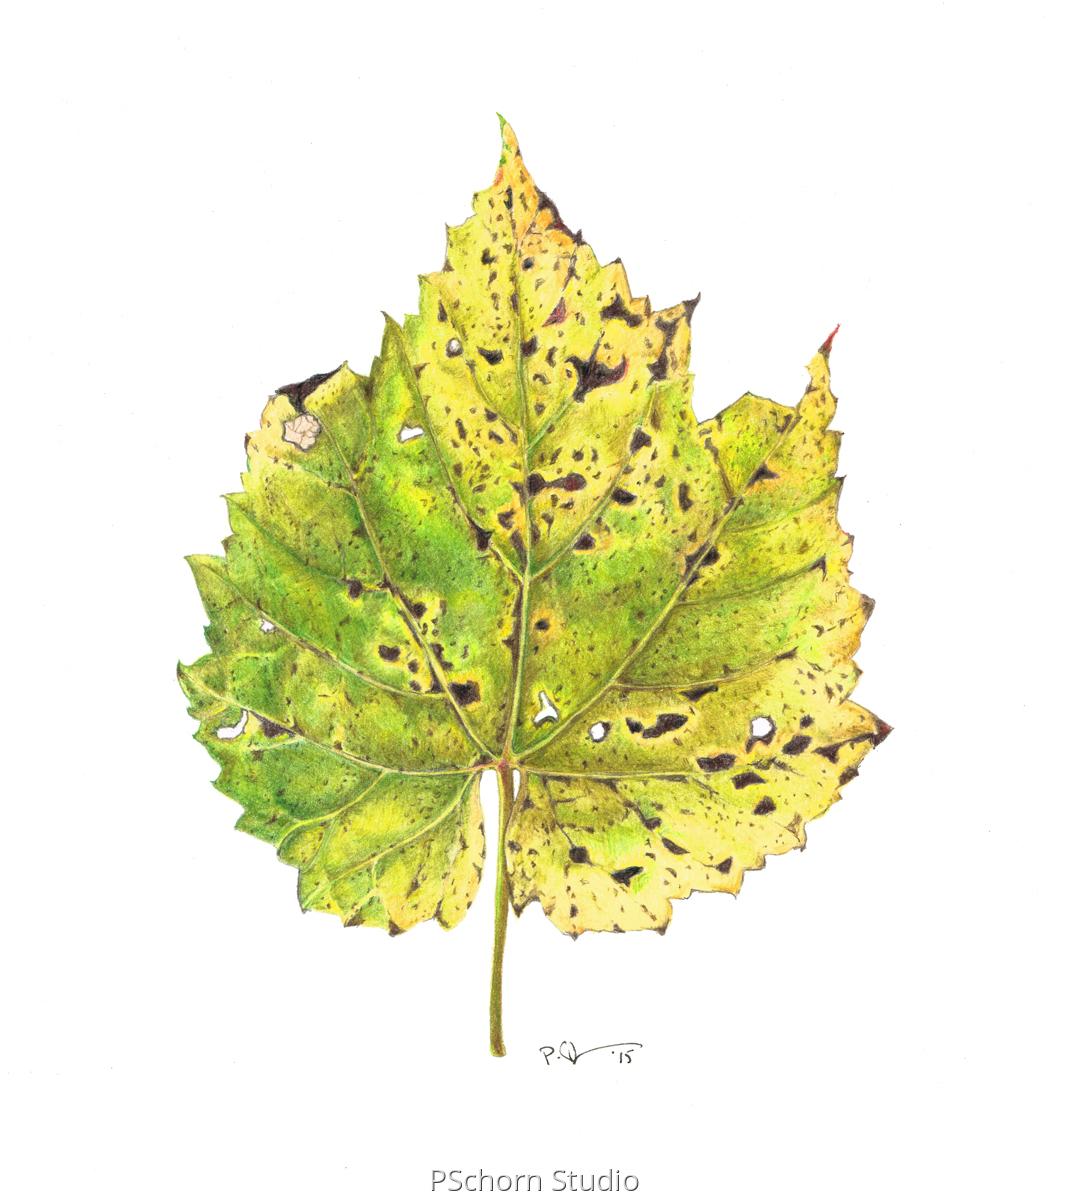 Leaf 7 (large view)